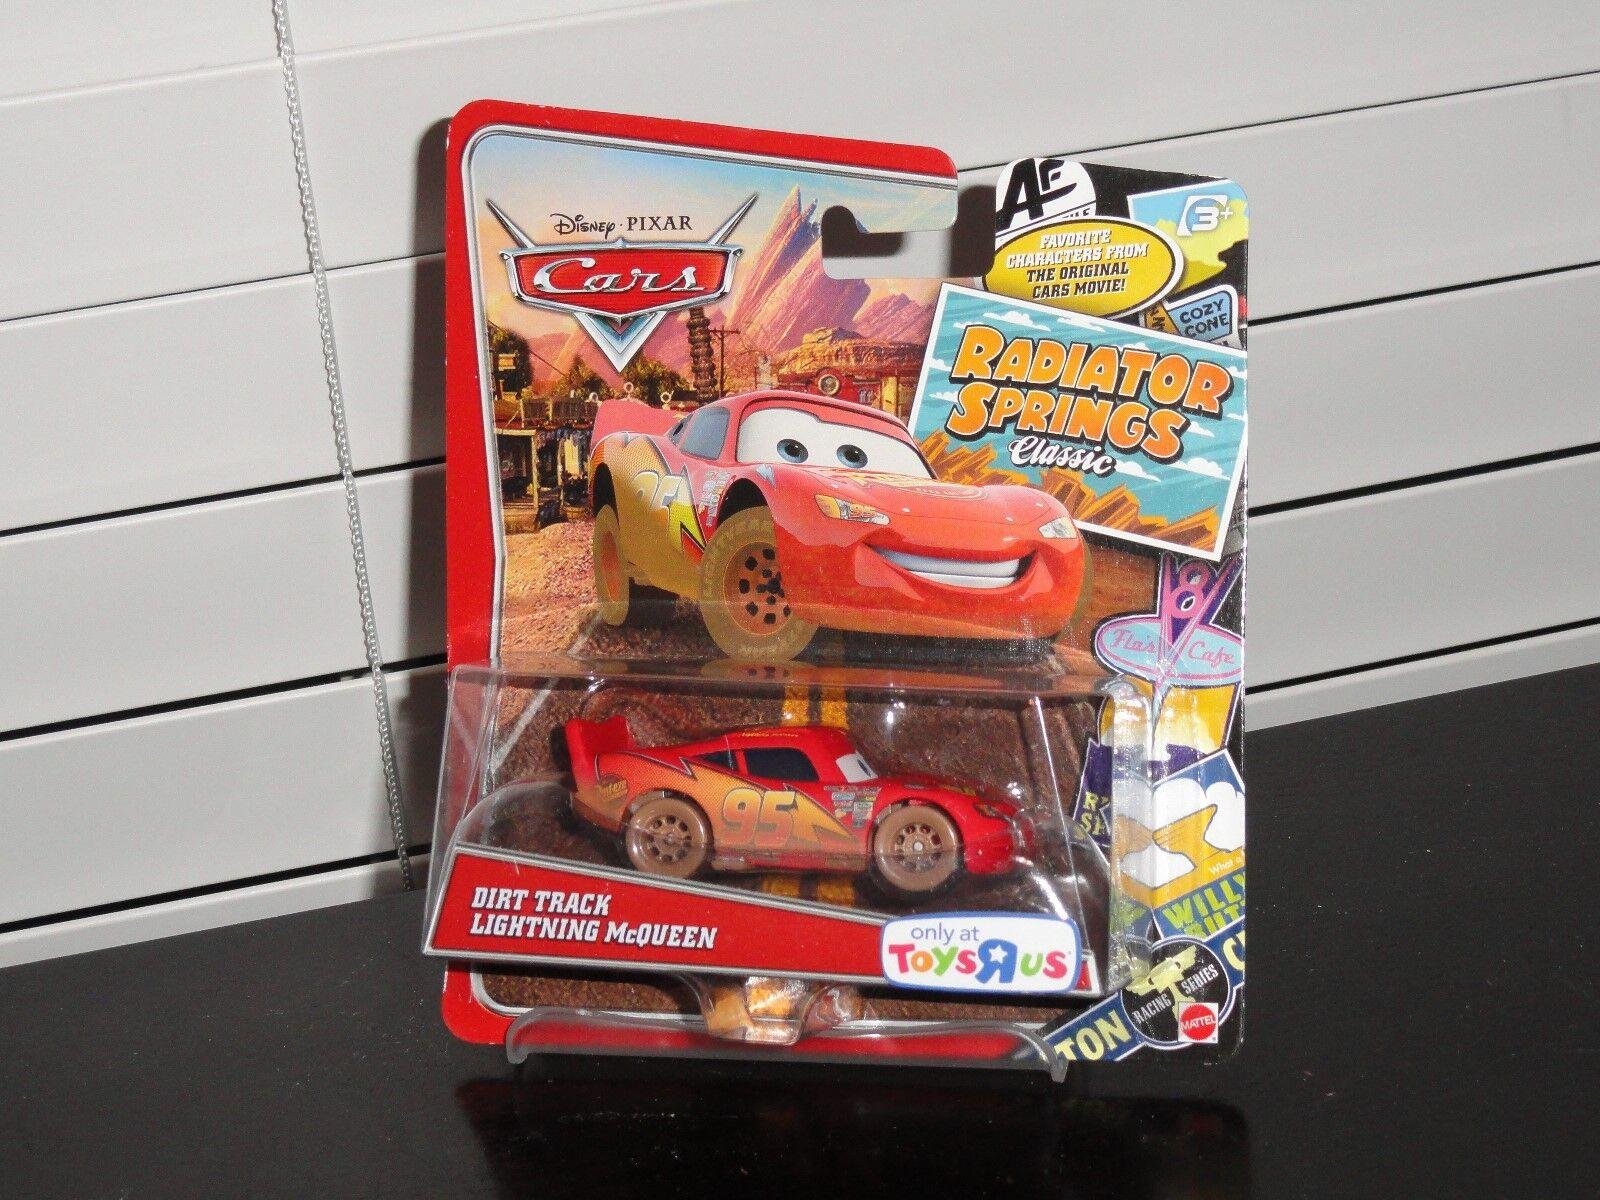 Disney Cars Radiator Springs Classic Dirt Track Lightning Mcqueen Toys R Us For Sale Online